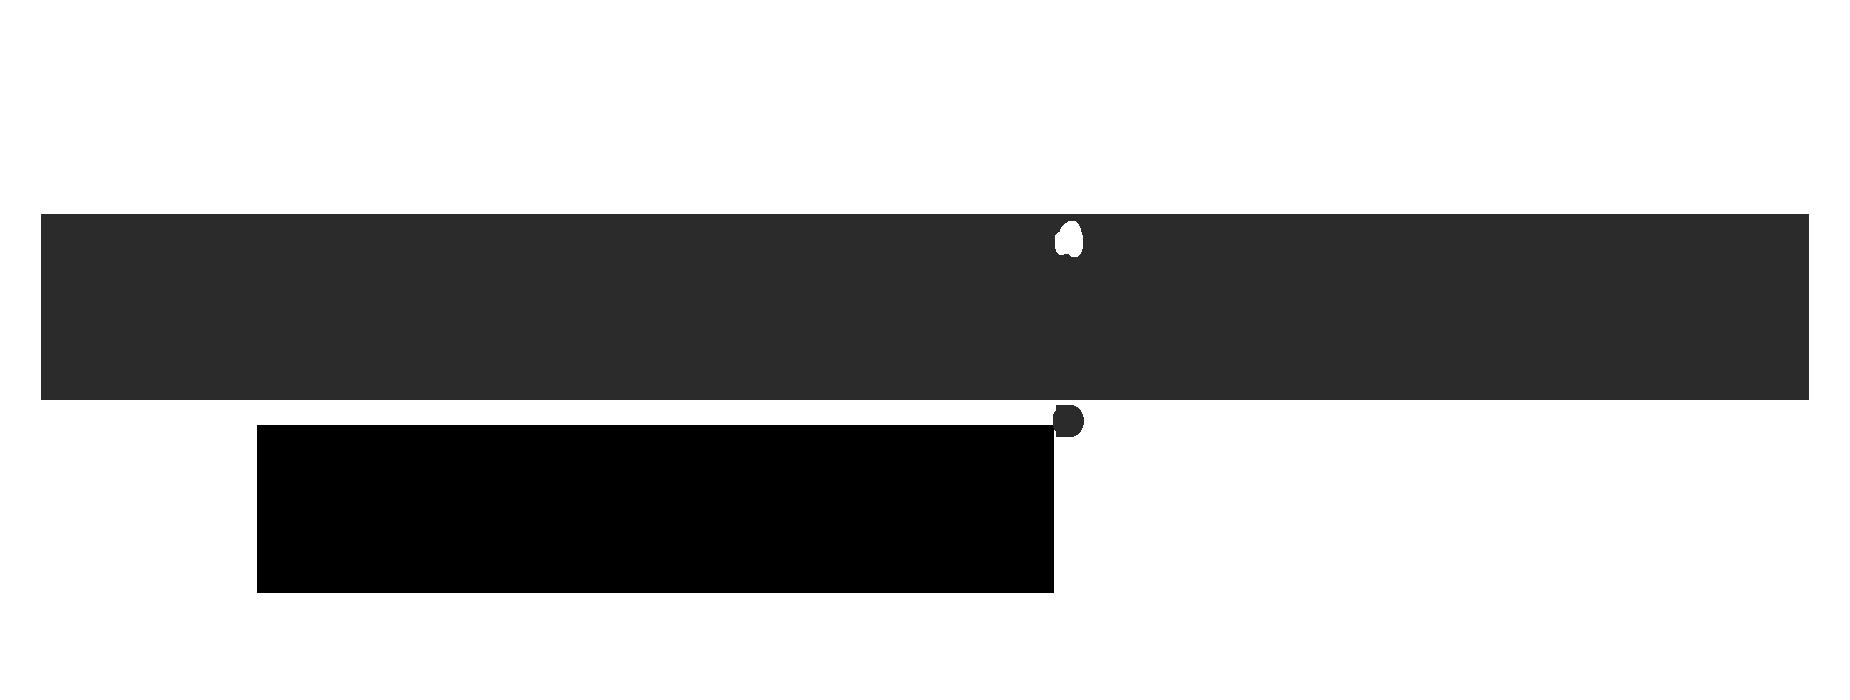 GolfProdiscount GmbH